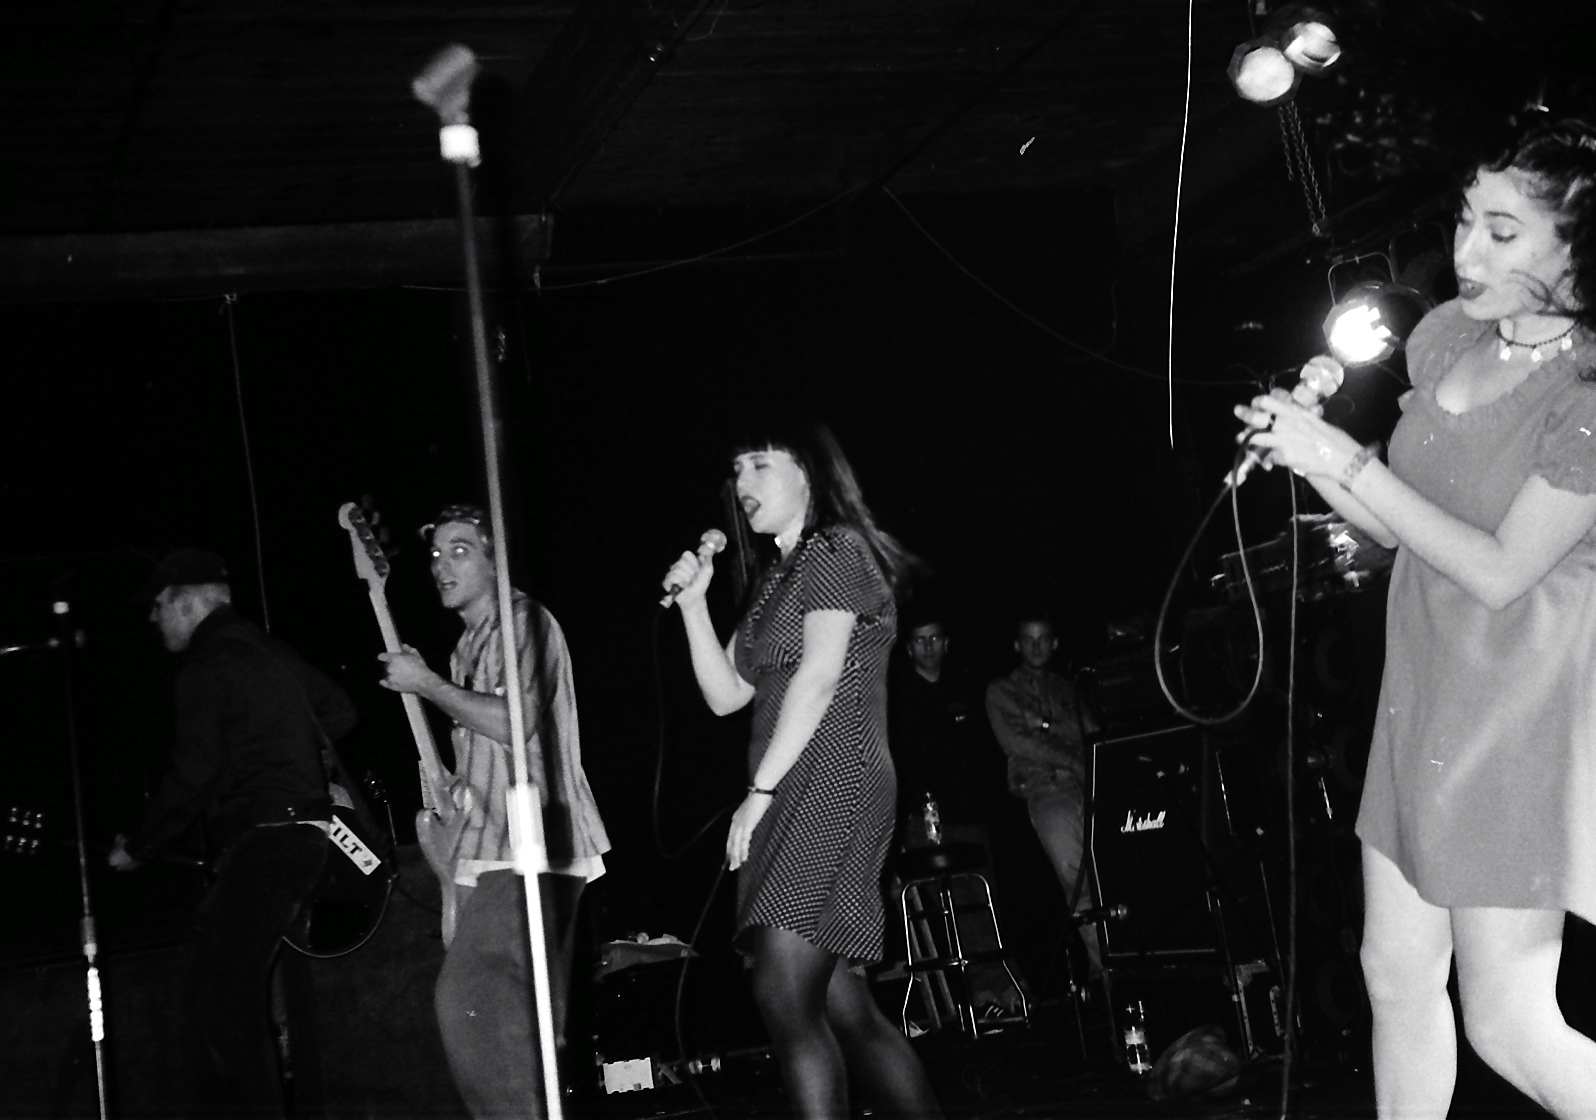 File:Dance Hall Crashers at The Masquerade in Atlanta, GA in 1998  (4847811346).jpg - Wikimedia Commons